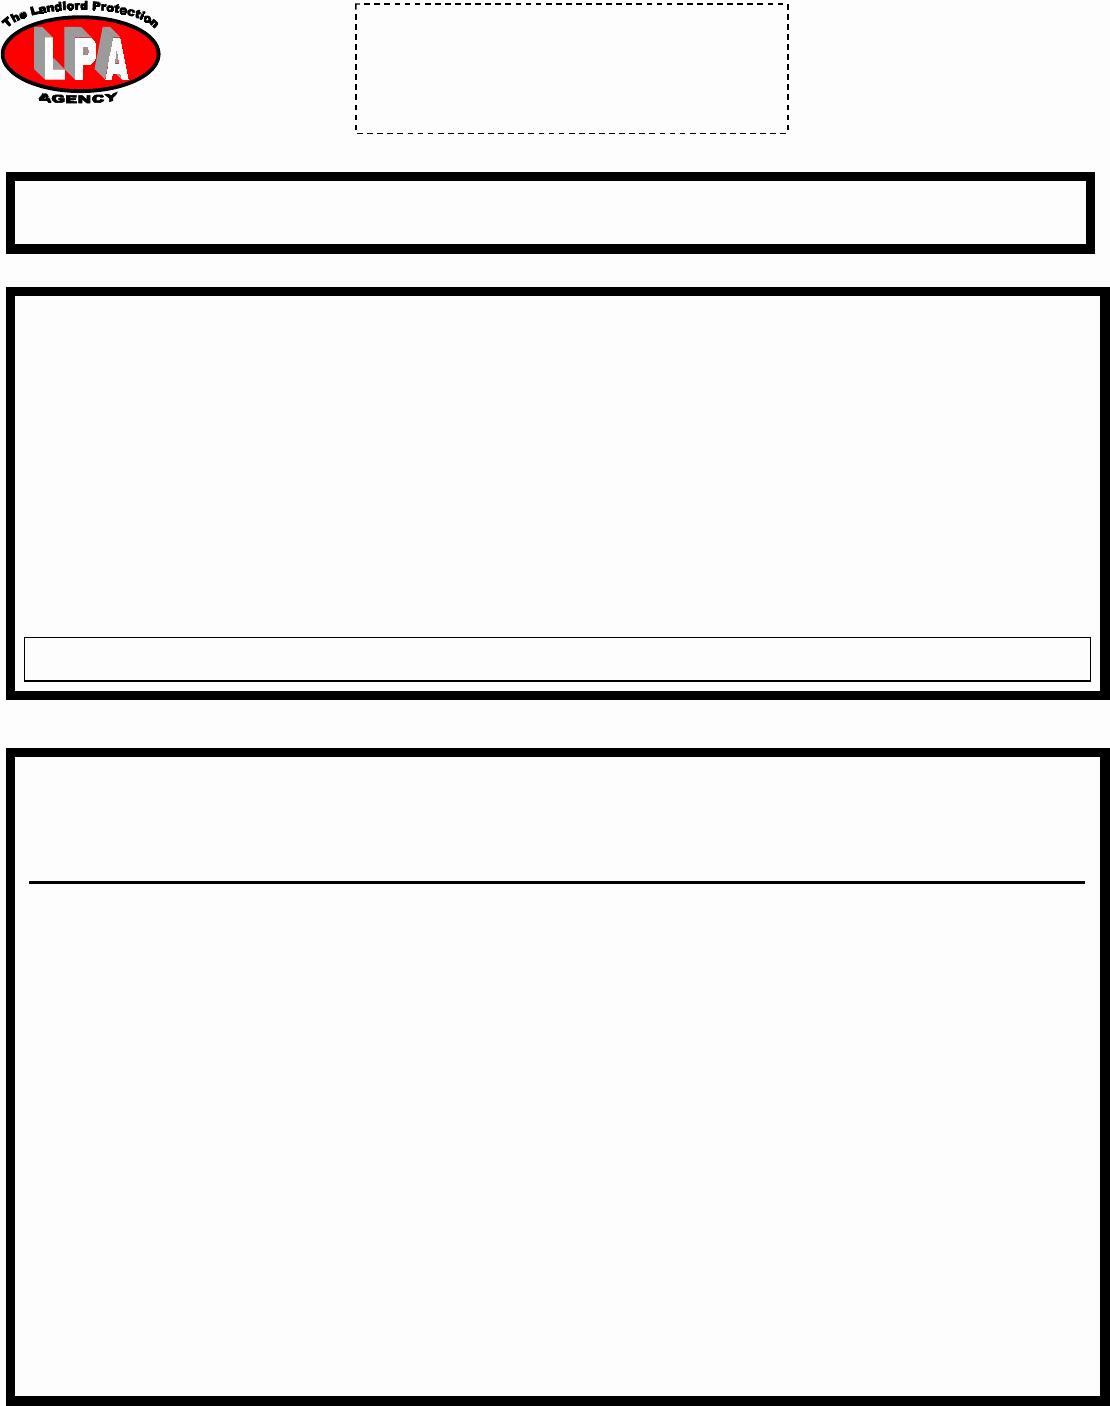 Excel Work order Template Beautiful Download Maintenance Work order Template Excel for Free